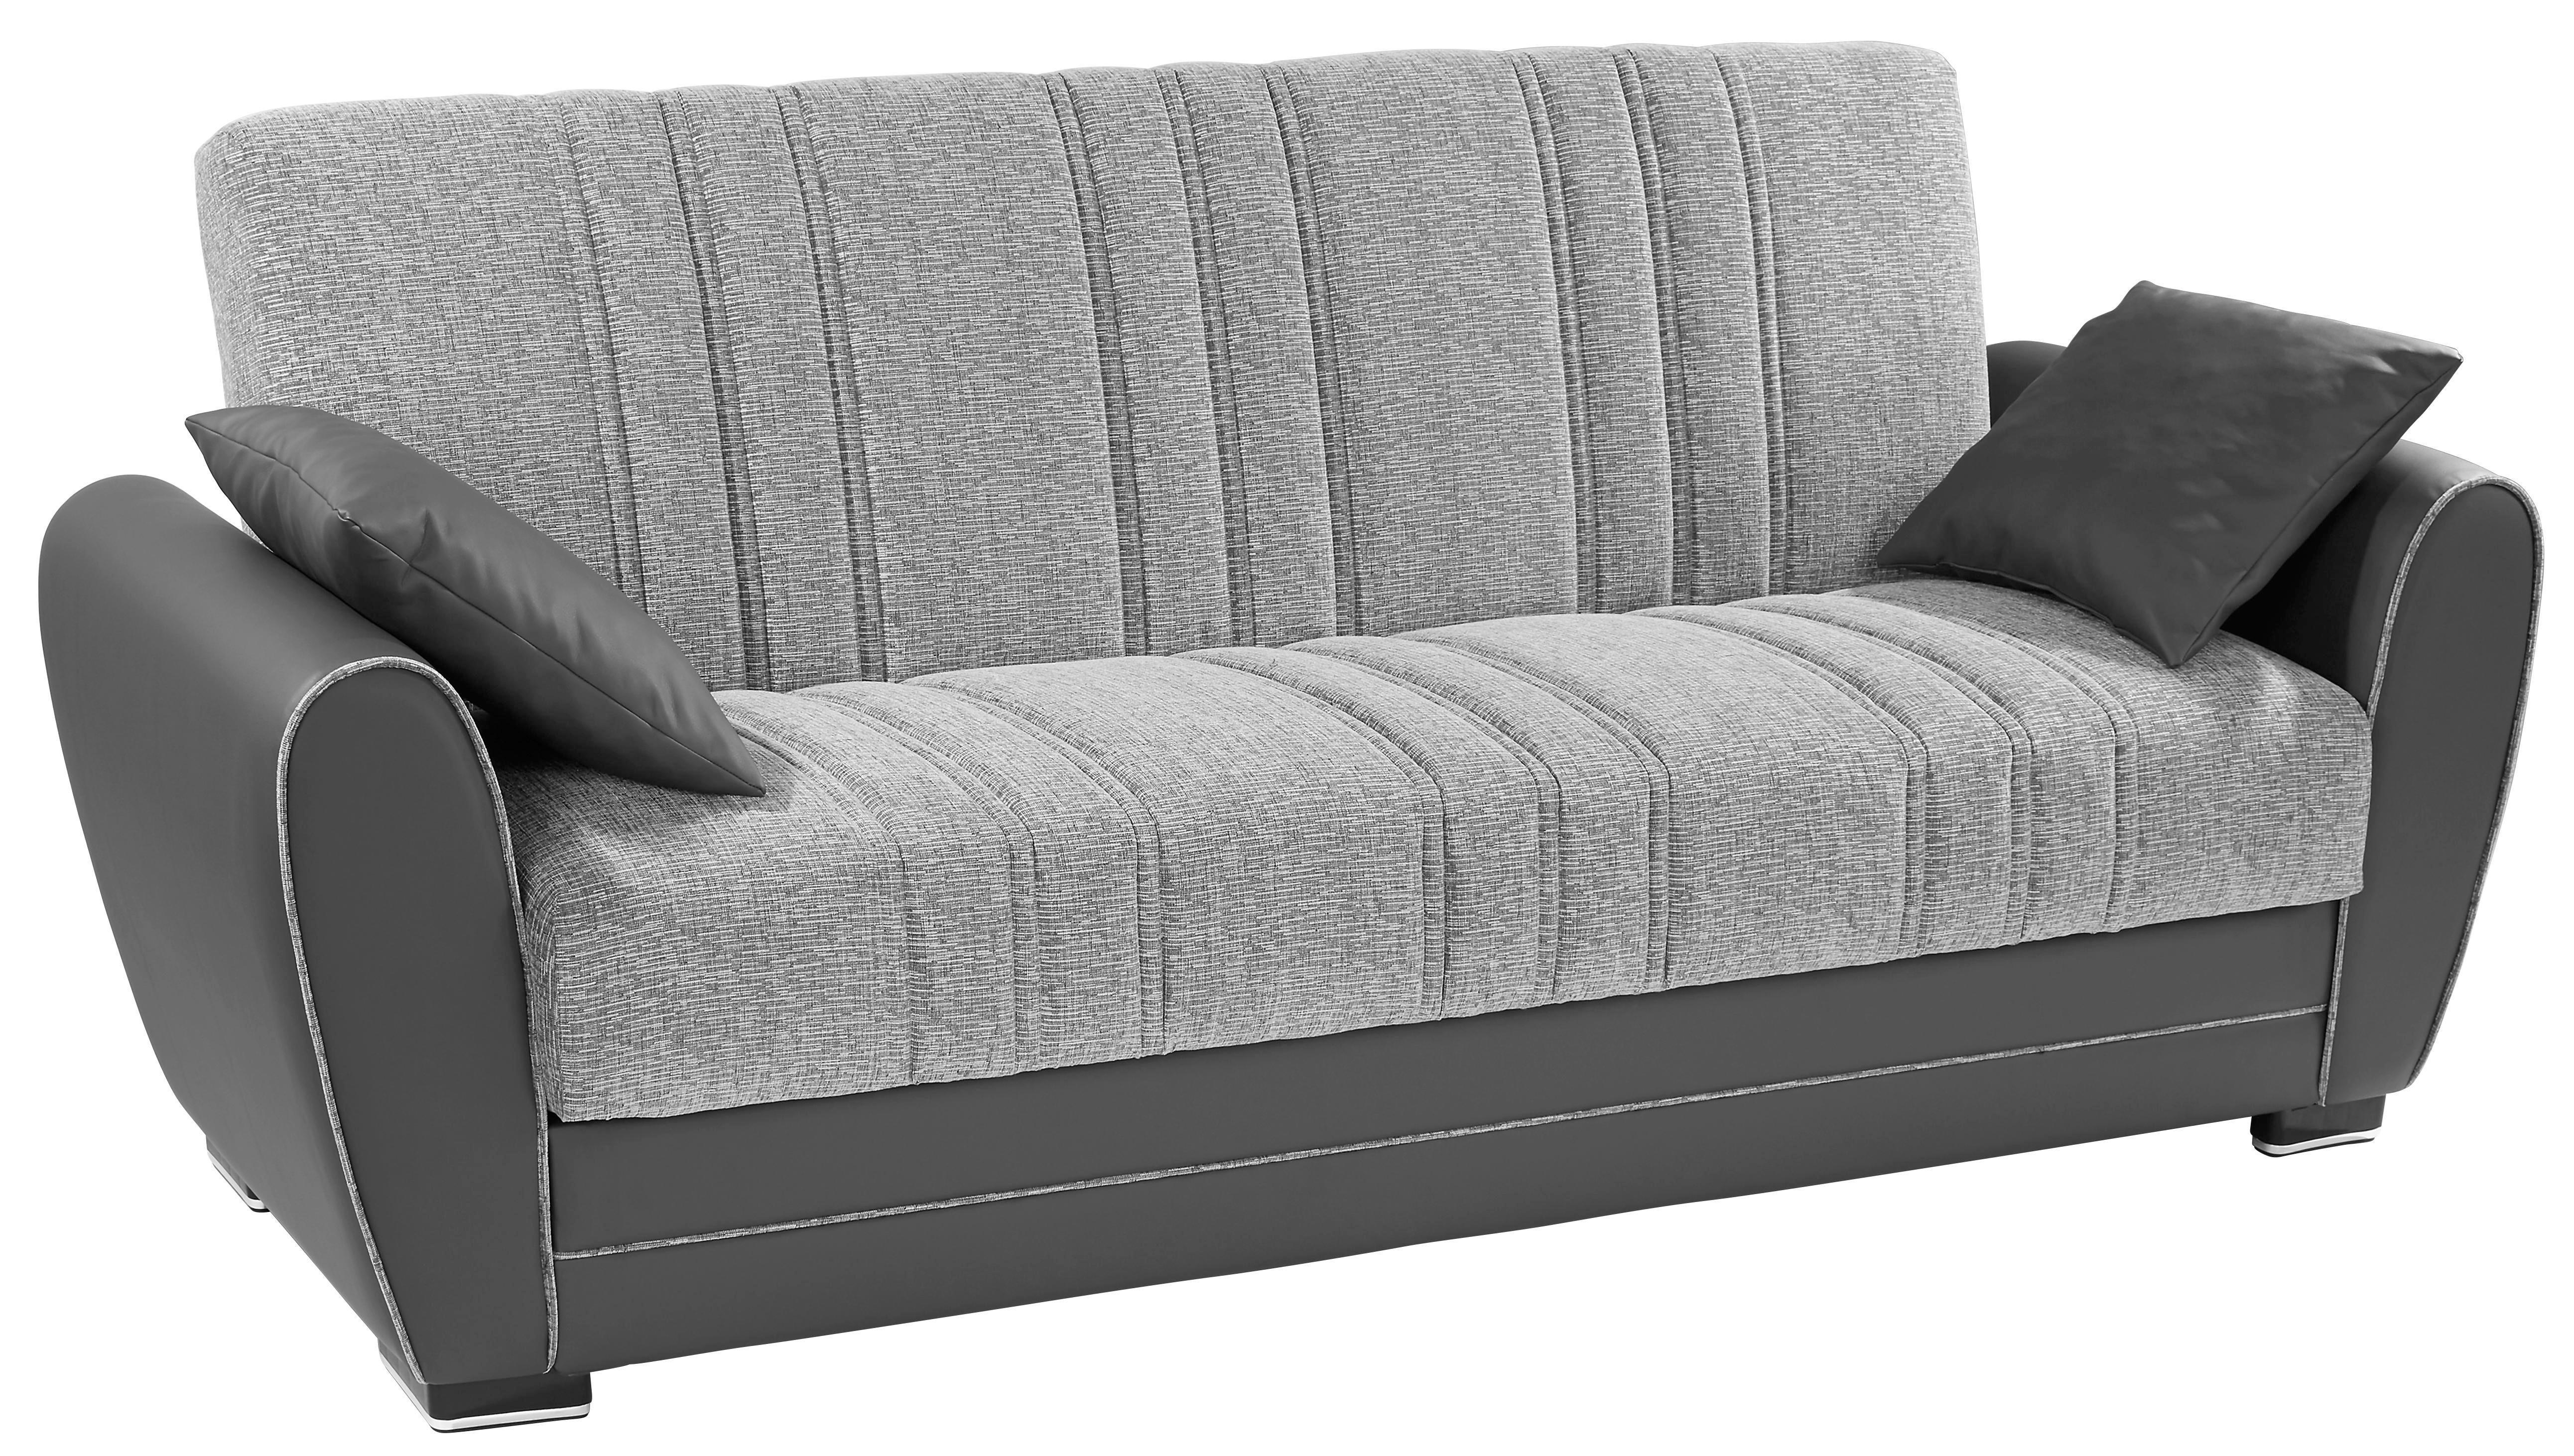 Rozkládací Pohovka Pelin - šedá, Moderní, kov/dřevo (235/85/90cm)